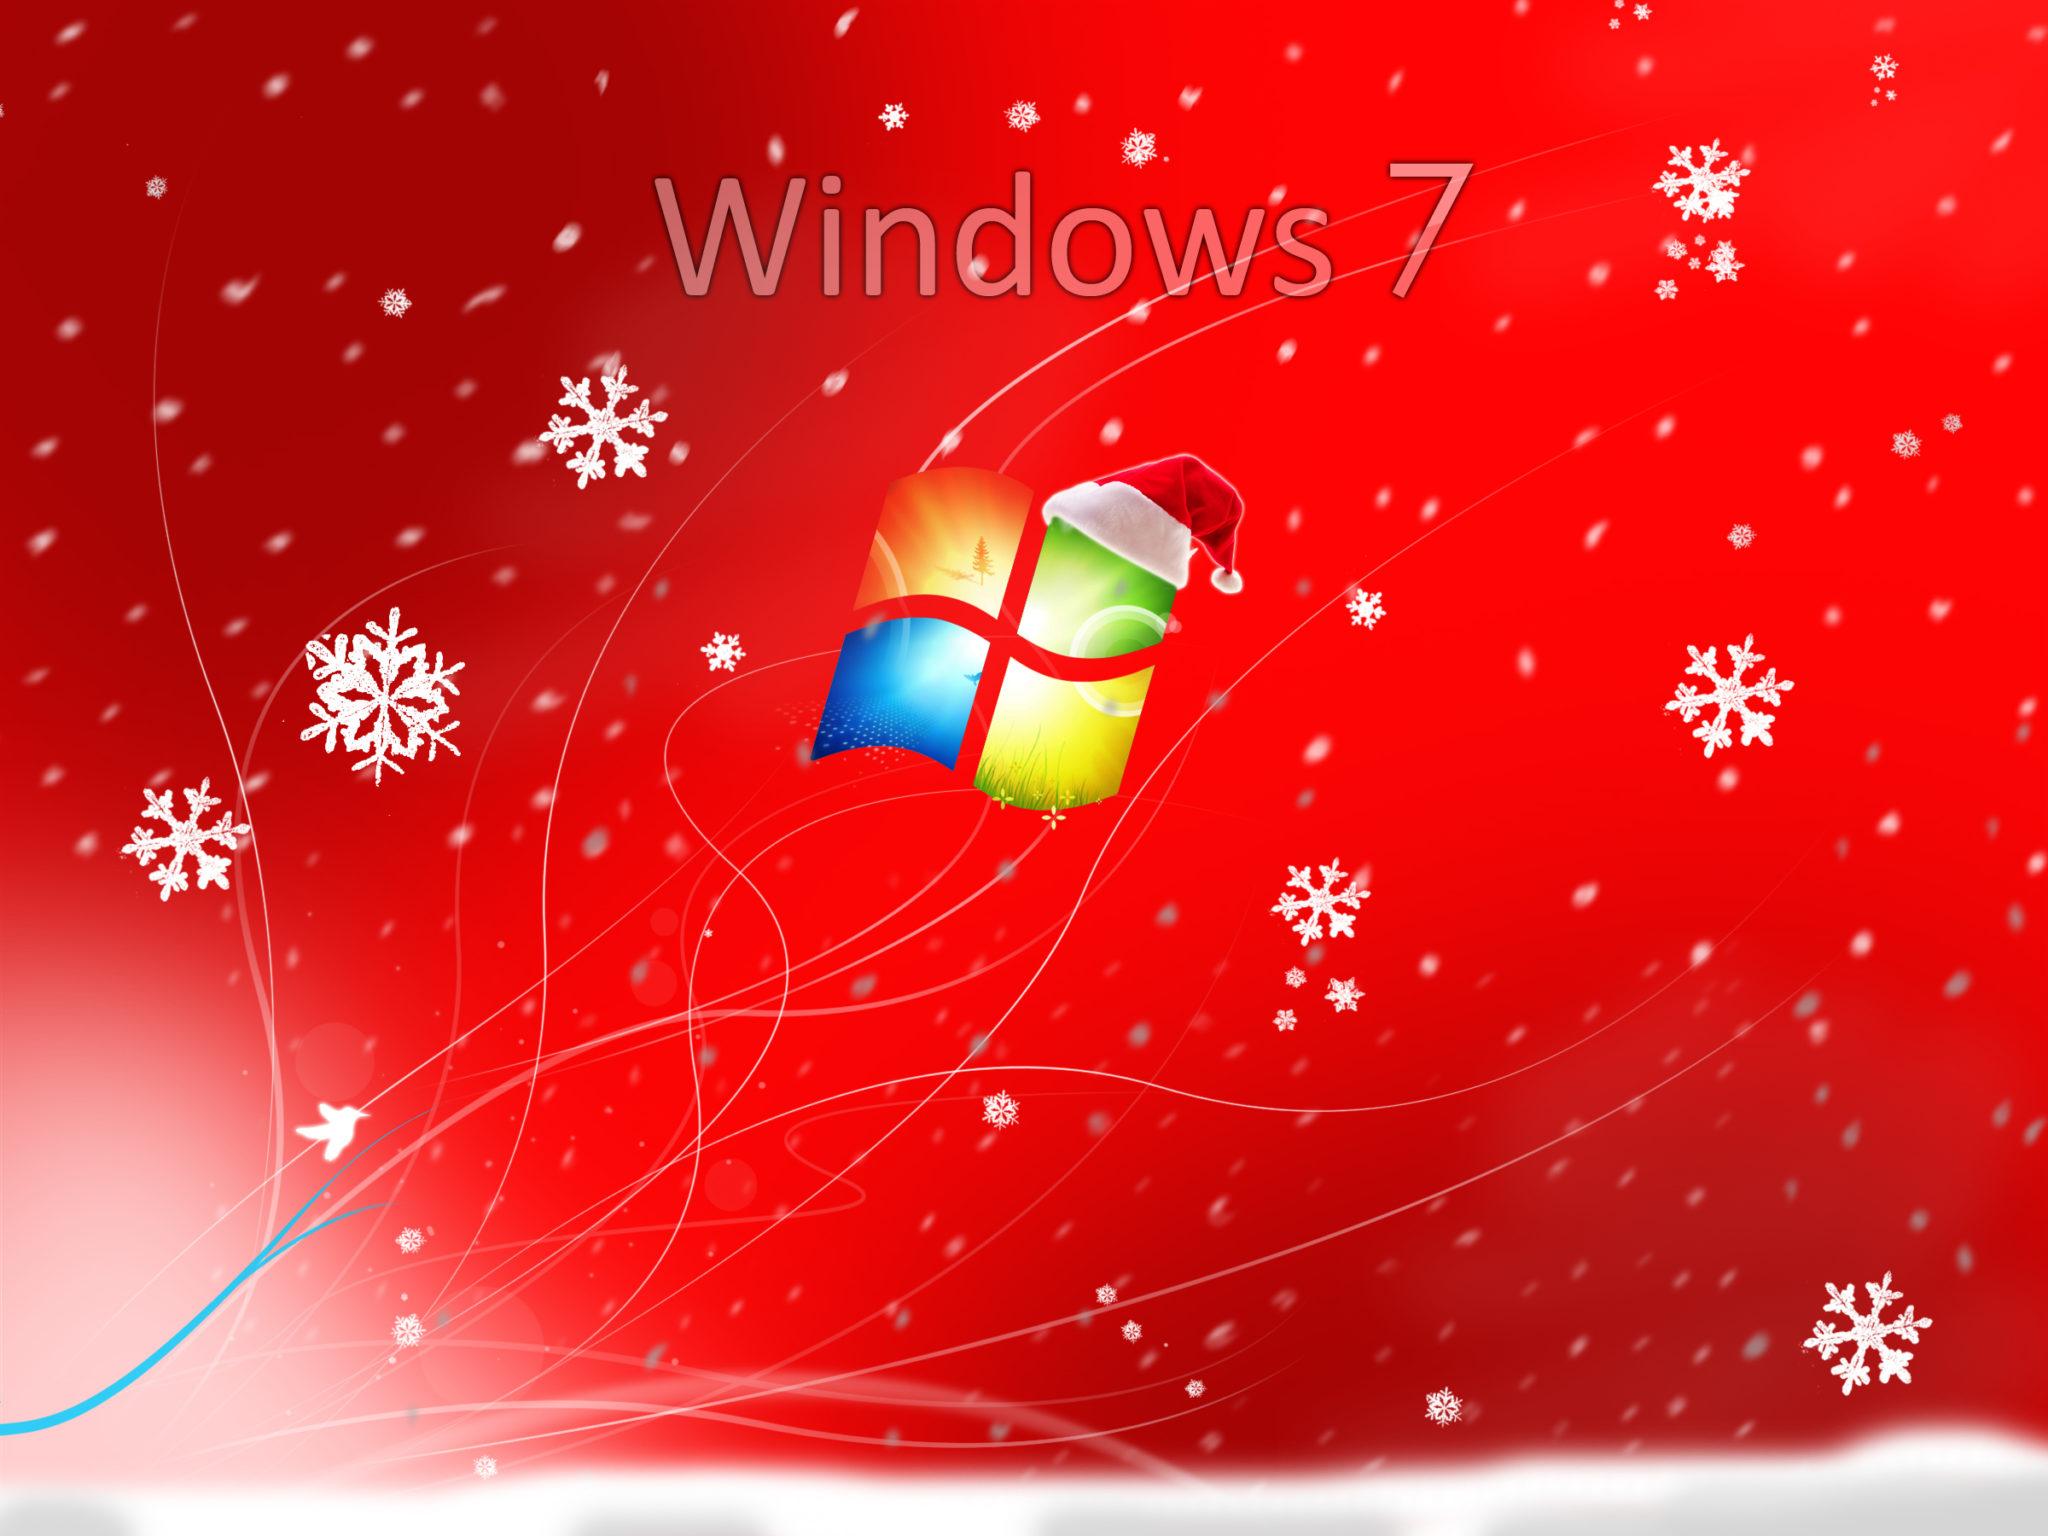 Windows_7_xMas_Wallpaper_v_1_by_atti12